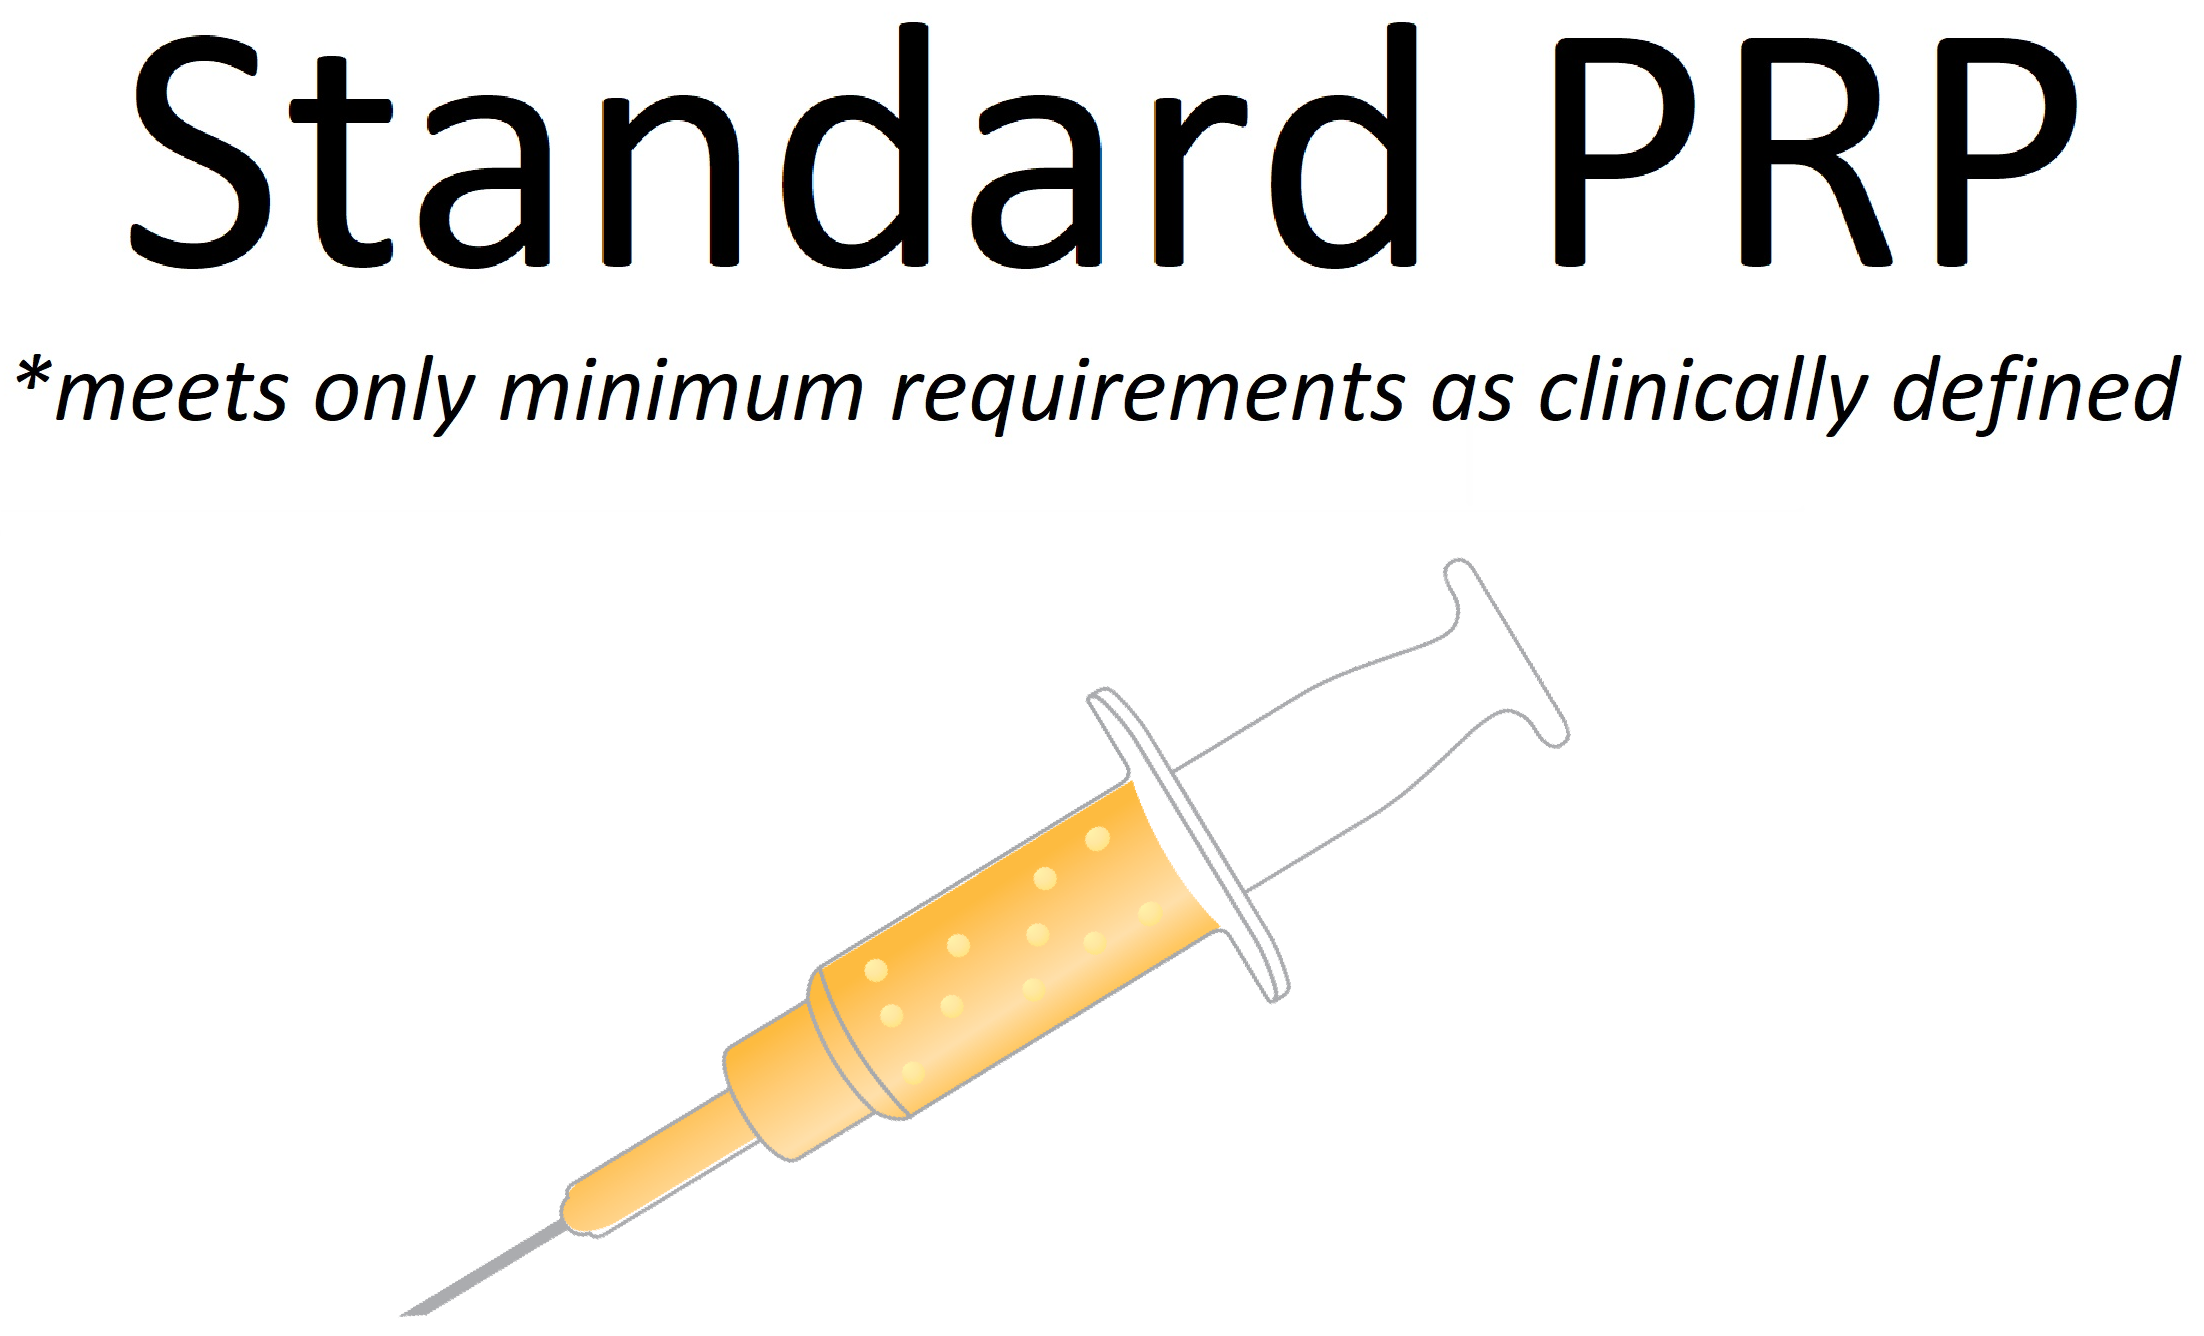 standard-prp.png